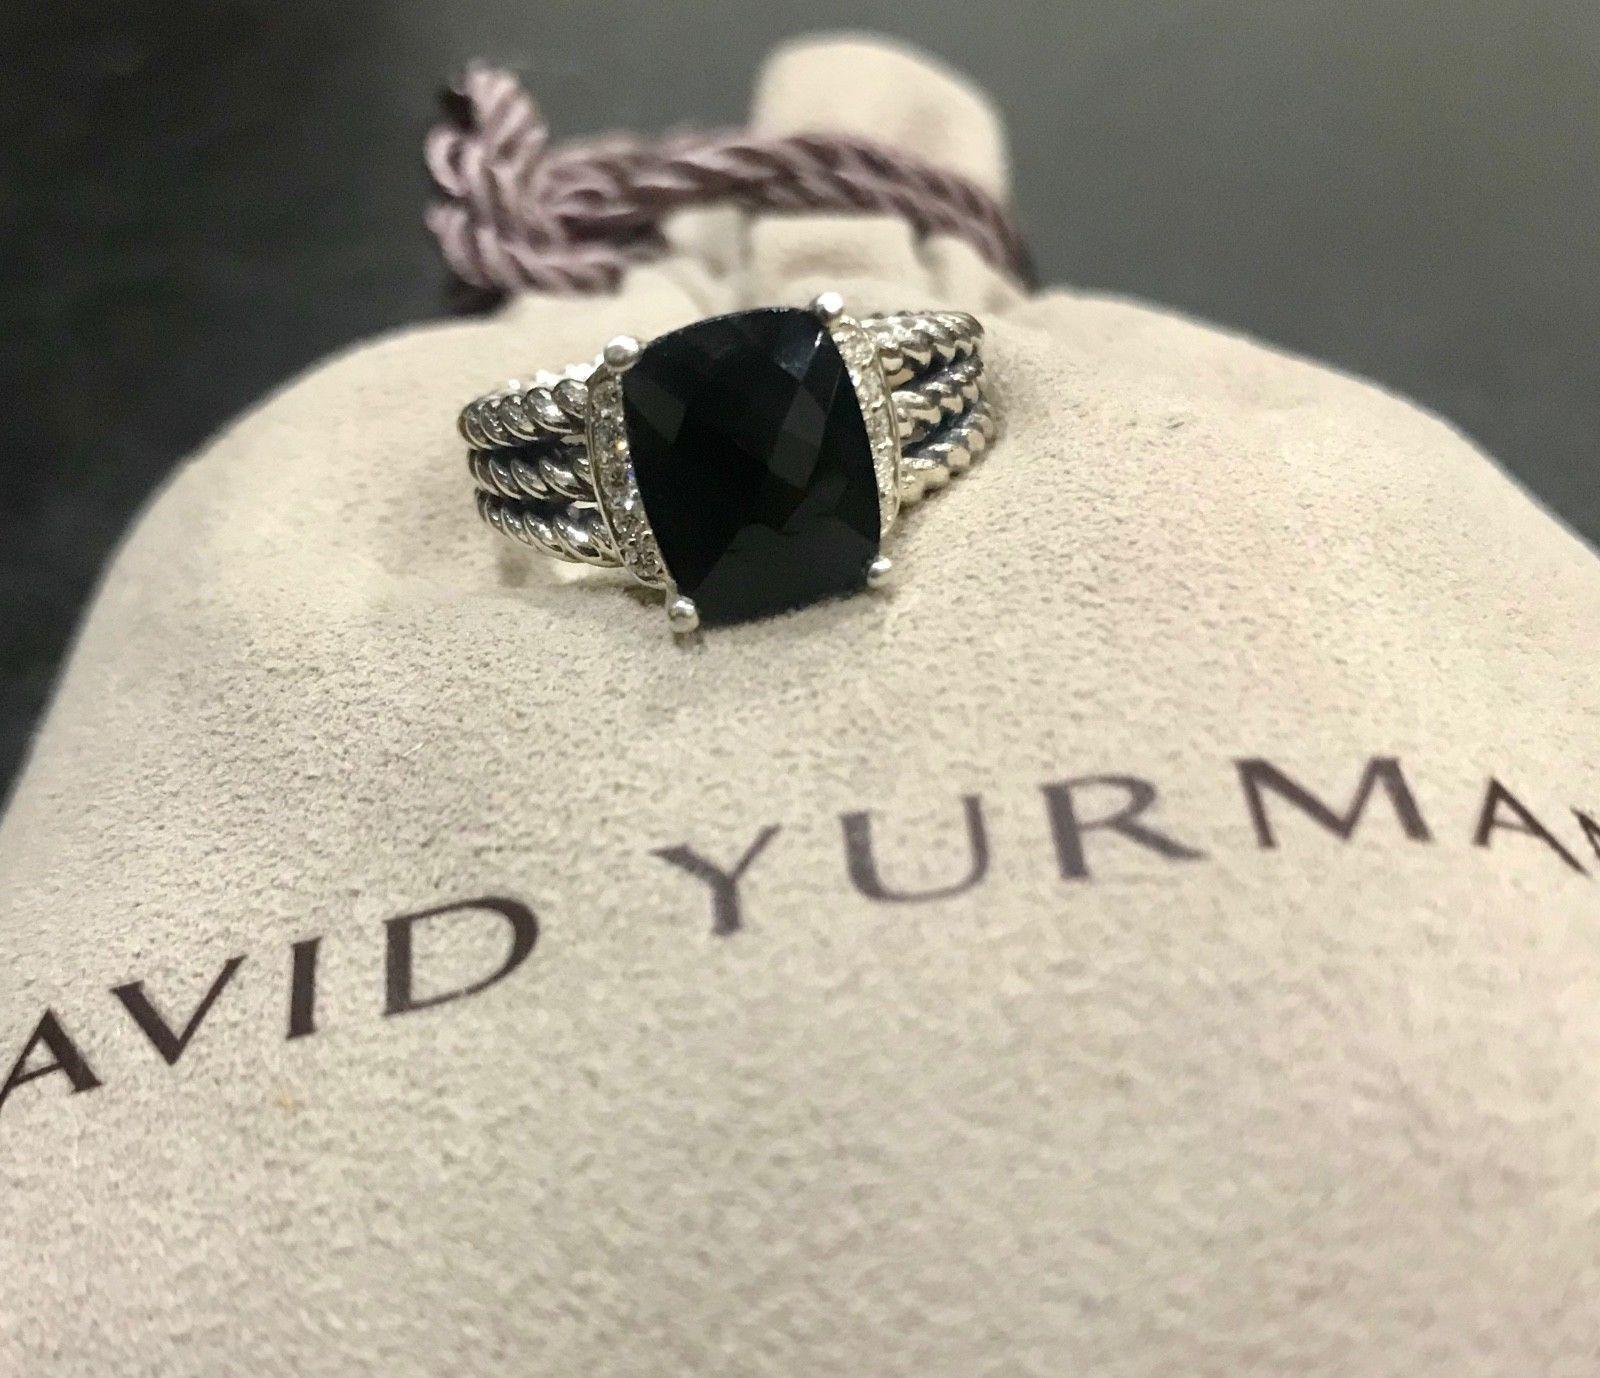 b7fb0d06ac86f David Yurman Ring Petite Wheaton Black Onyx and 40 similar items. 57